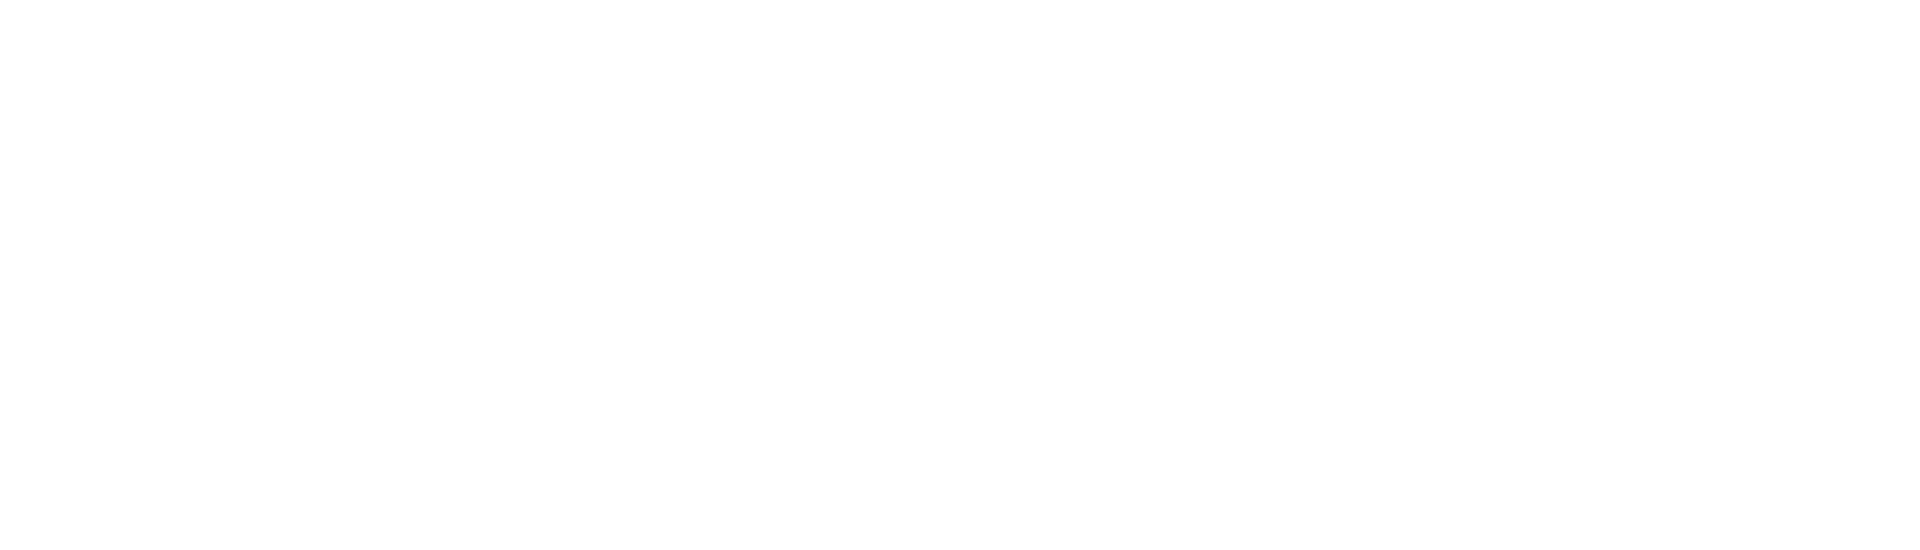 catalog/Sliders/envelopamento/text.png